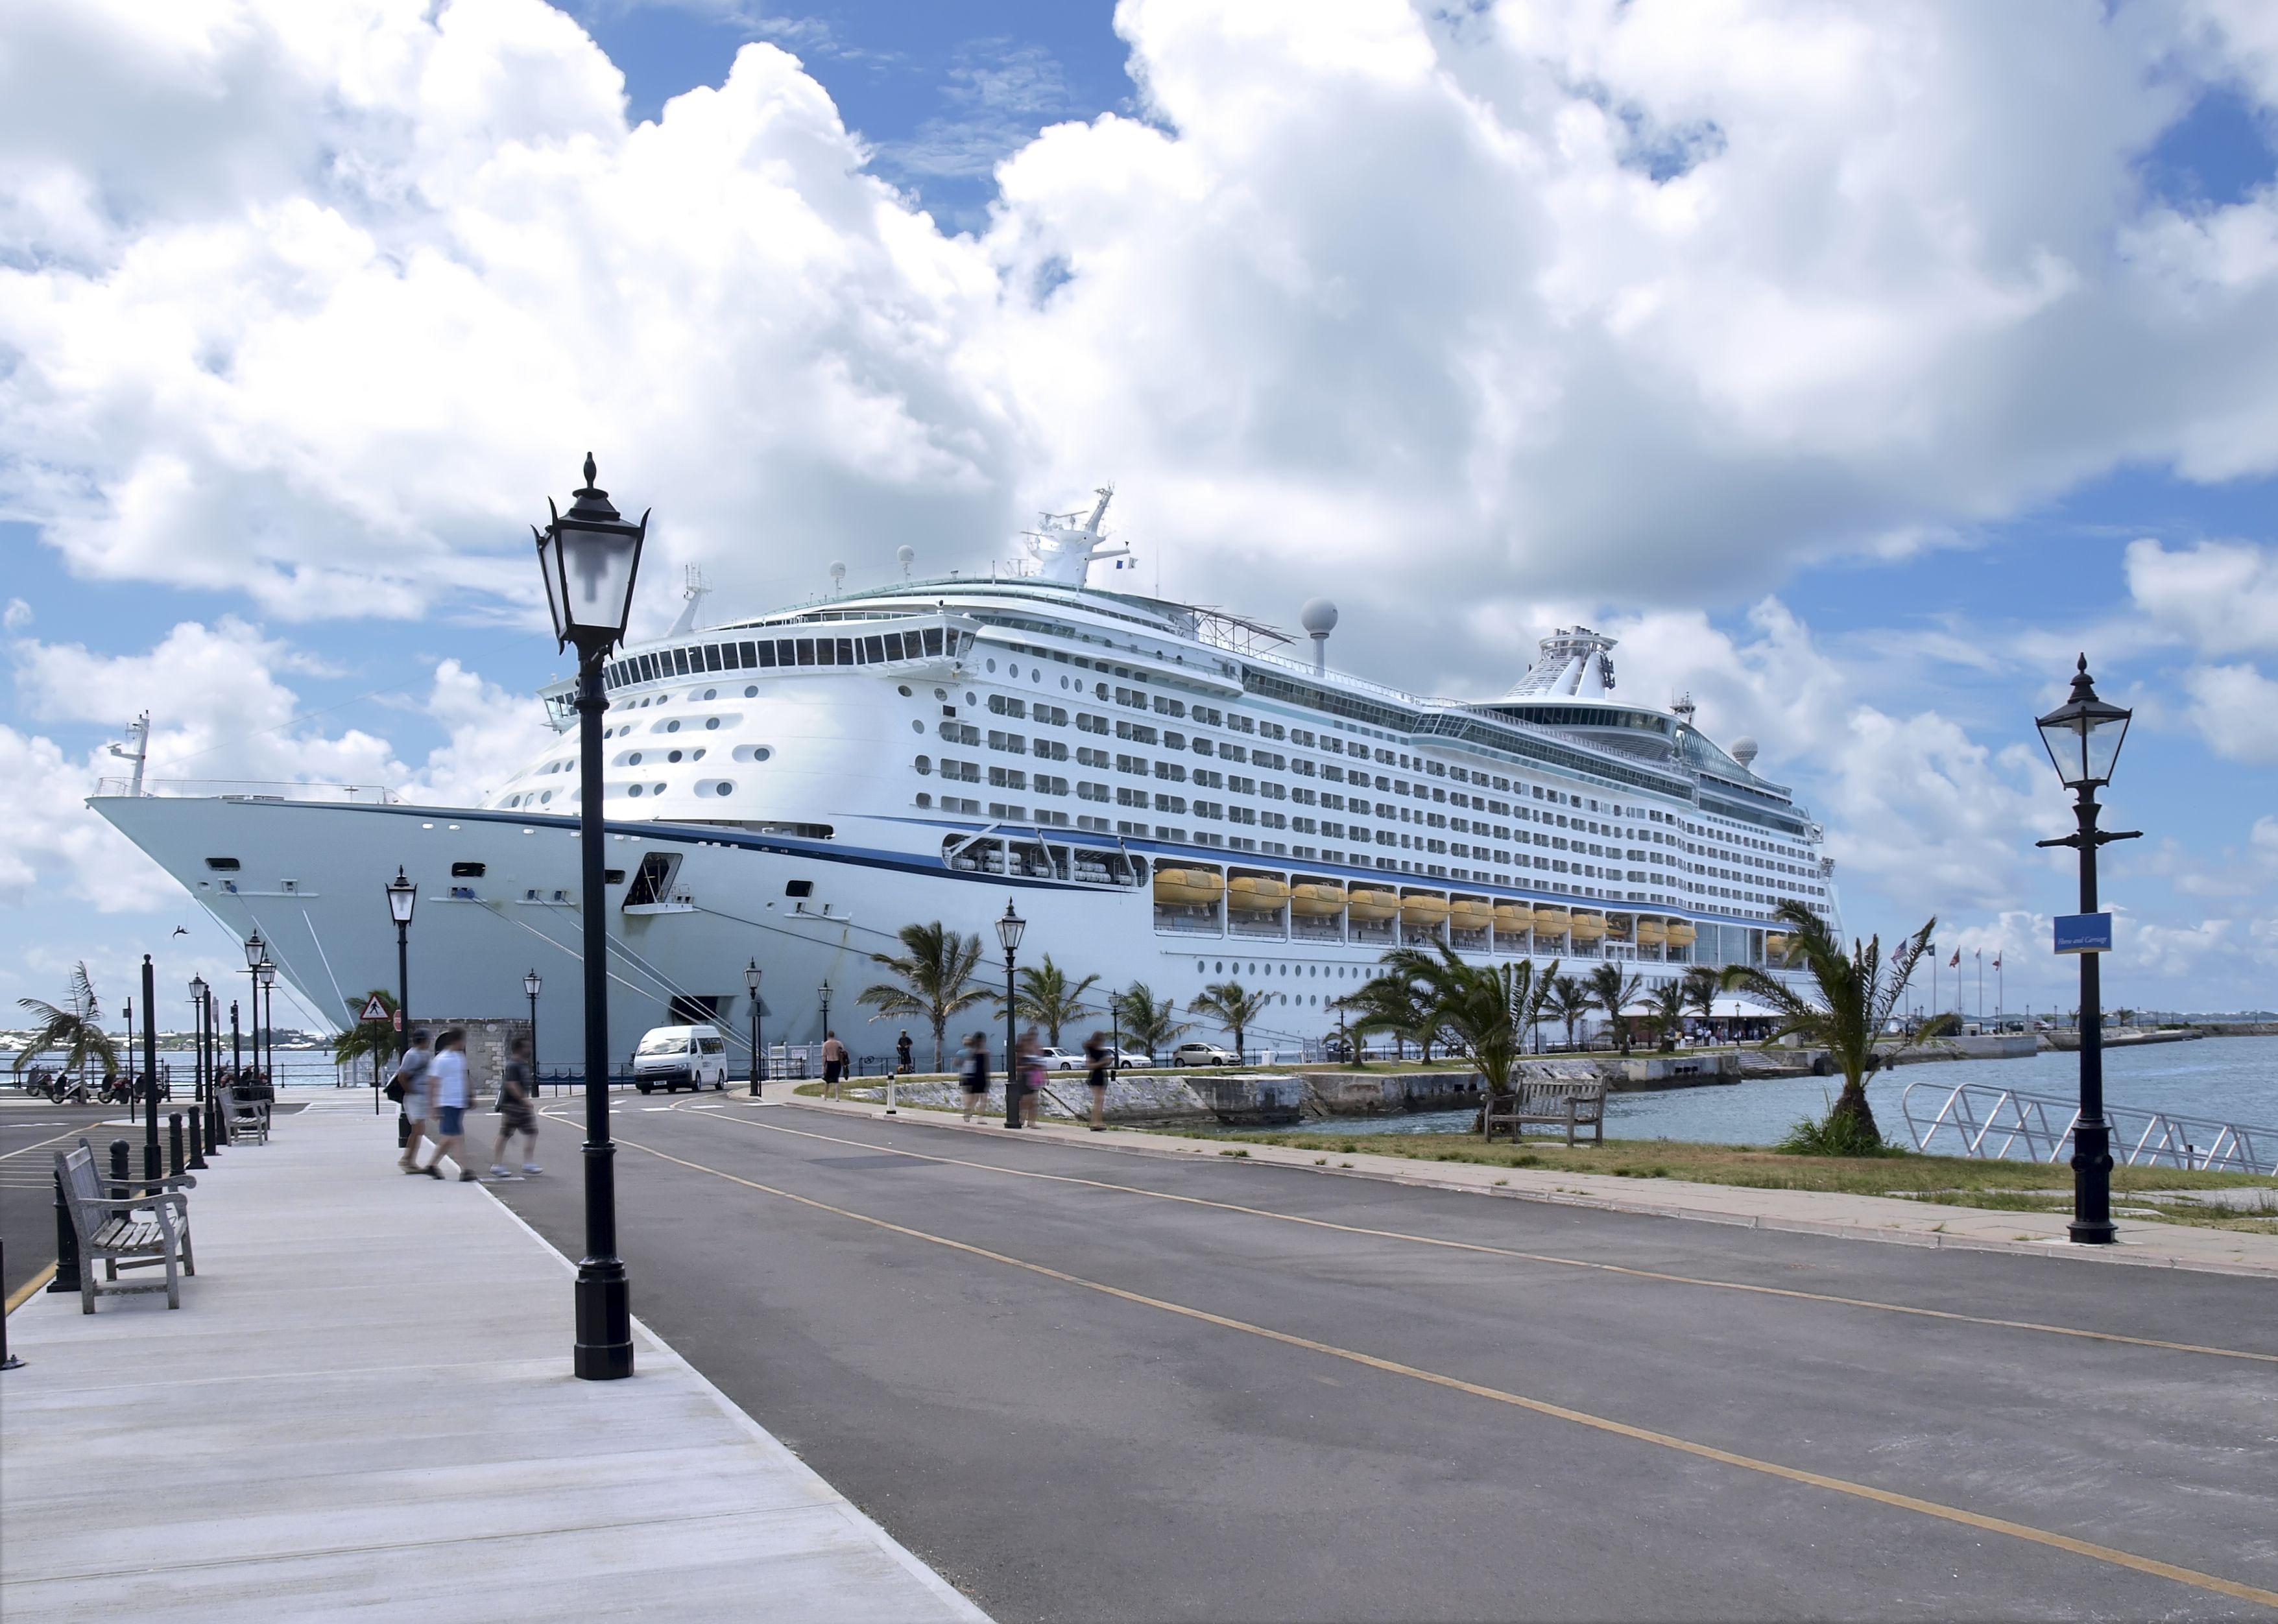 Bermuda cruise deals best cruises to bermuda - Welcome To Kings Wharf Cruise Ship Port Bermuda